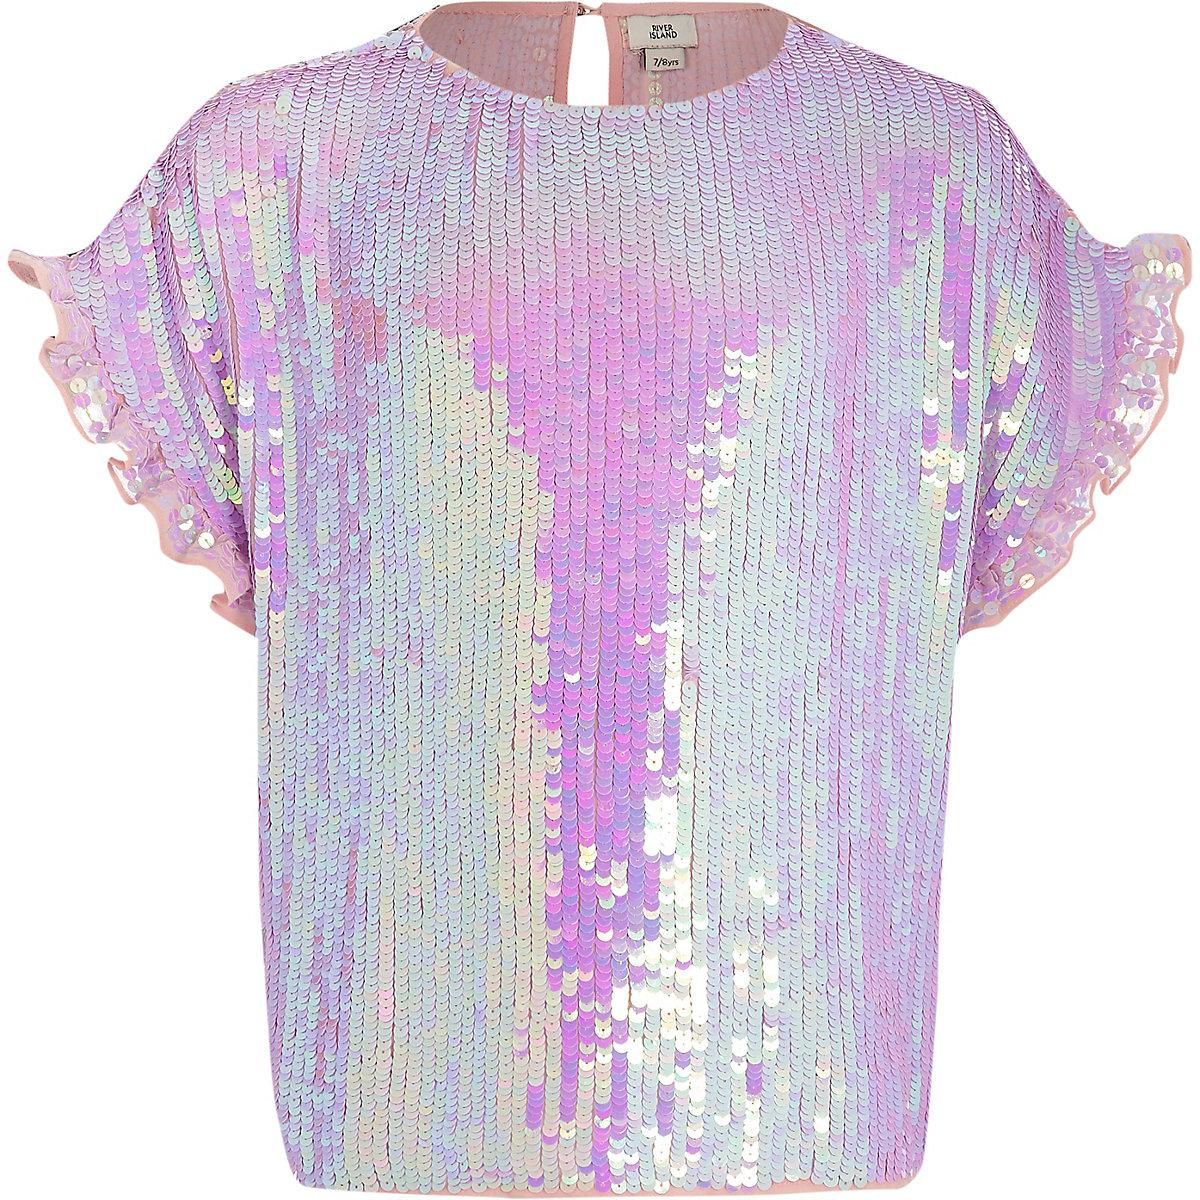 Girls purple sequin embellished T-shirt